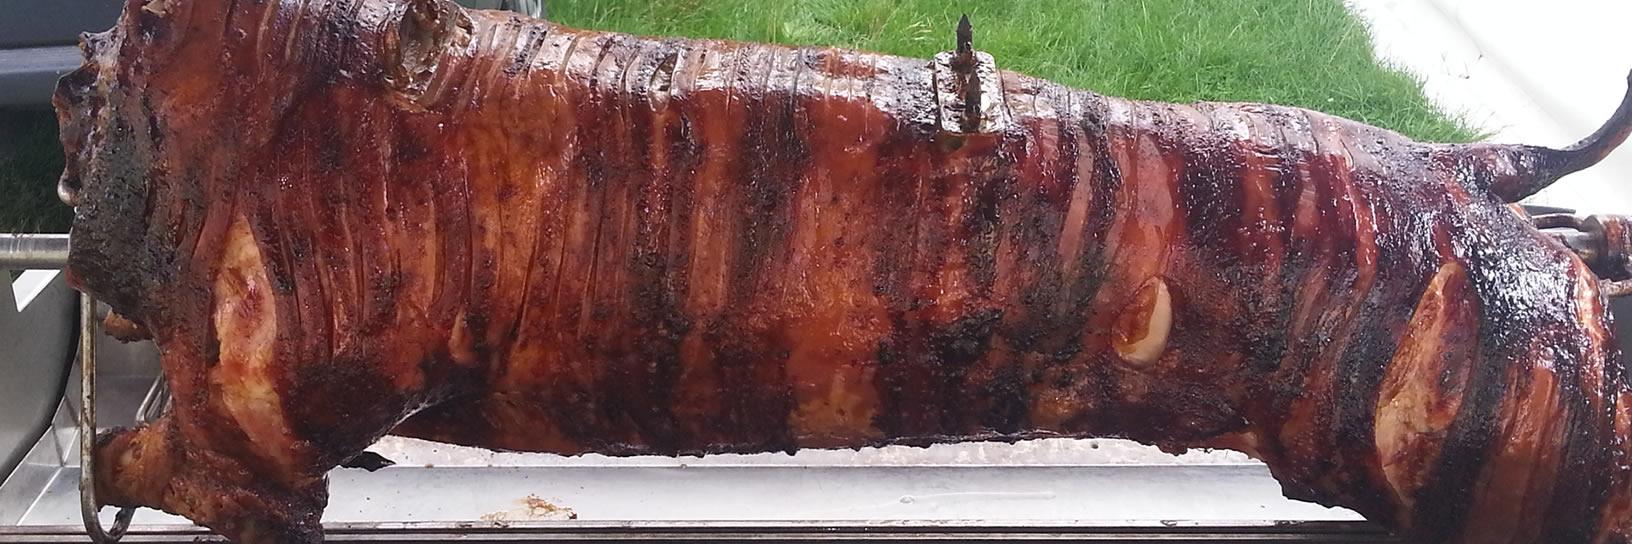 Hog Roast Kent Spit Roast Kent Caterers Kent 01227 752129